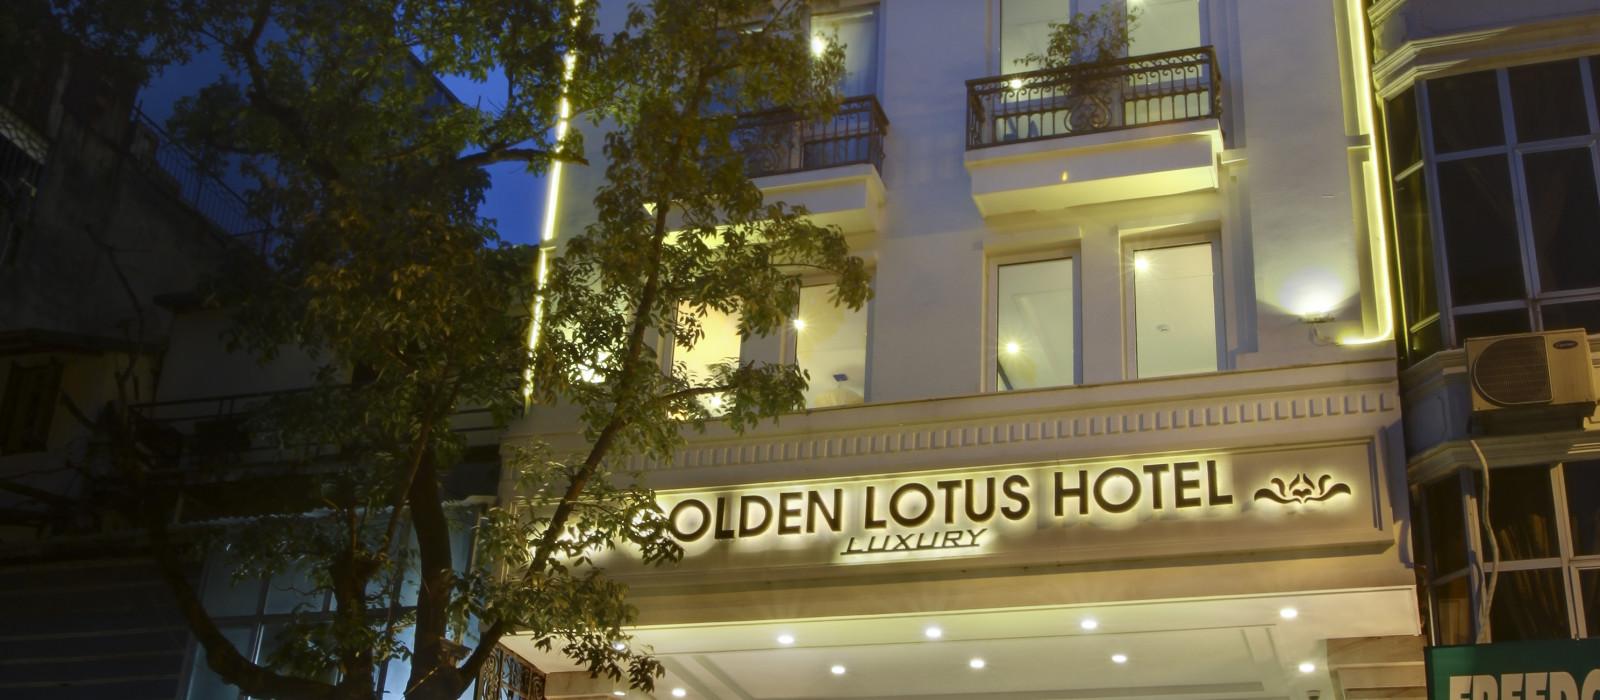 Hotel Golden Lotus Luxury Hanoi Vietnam